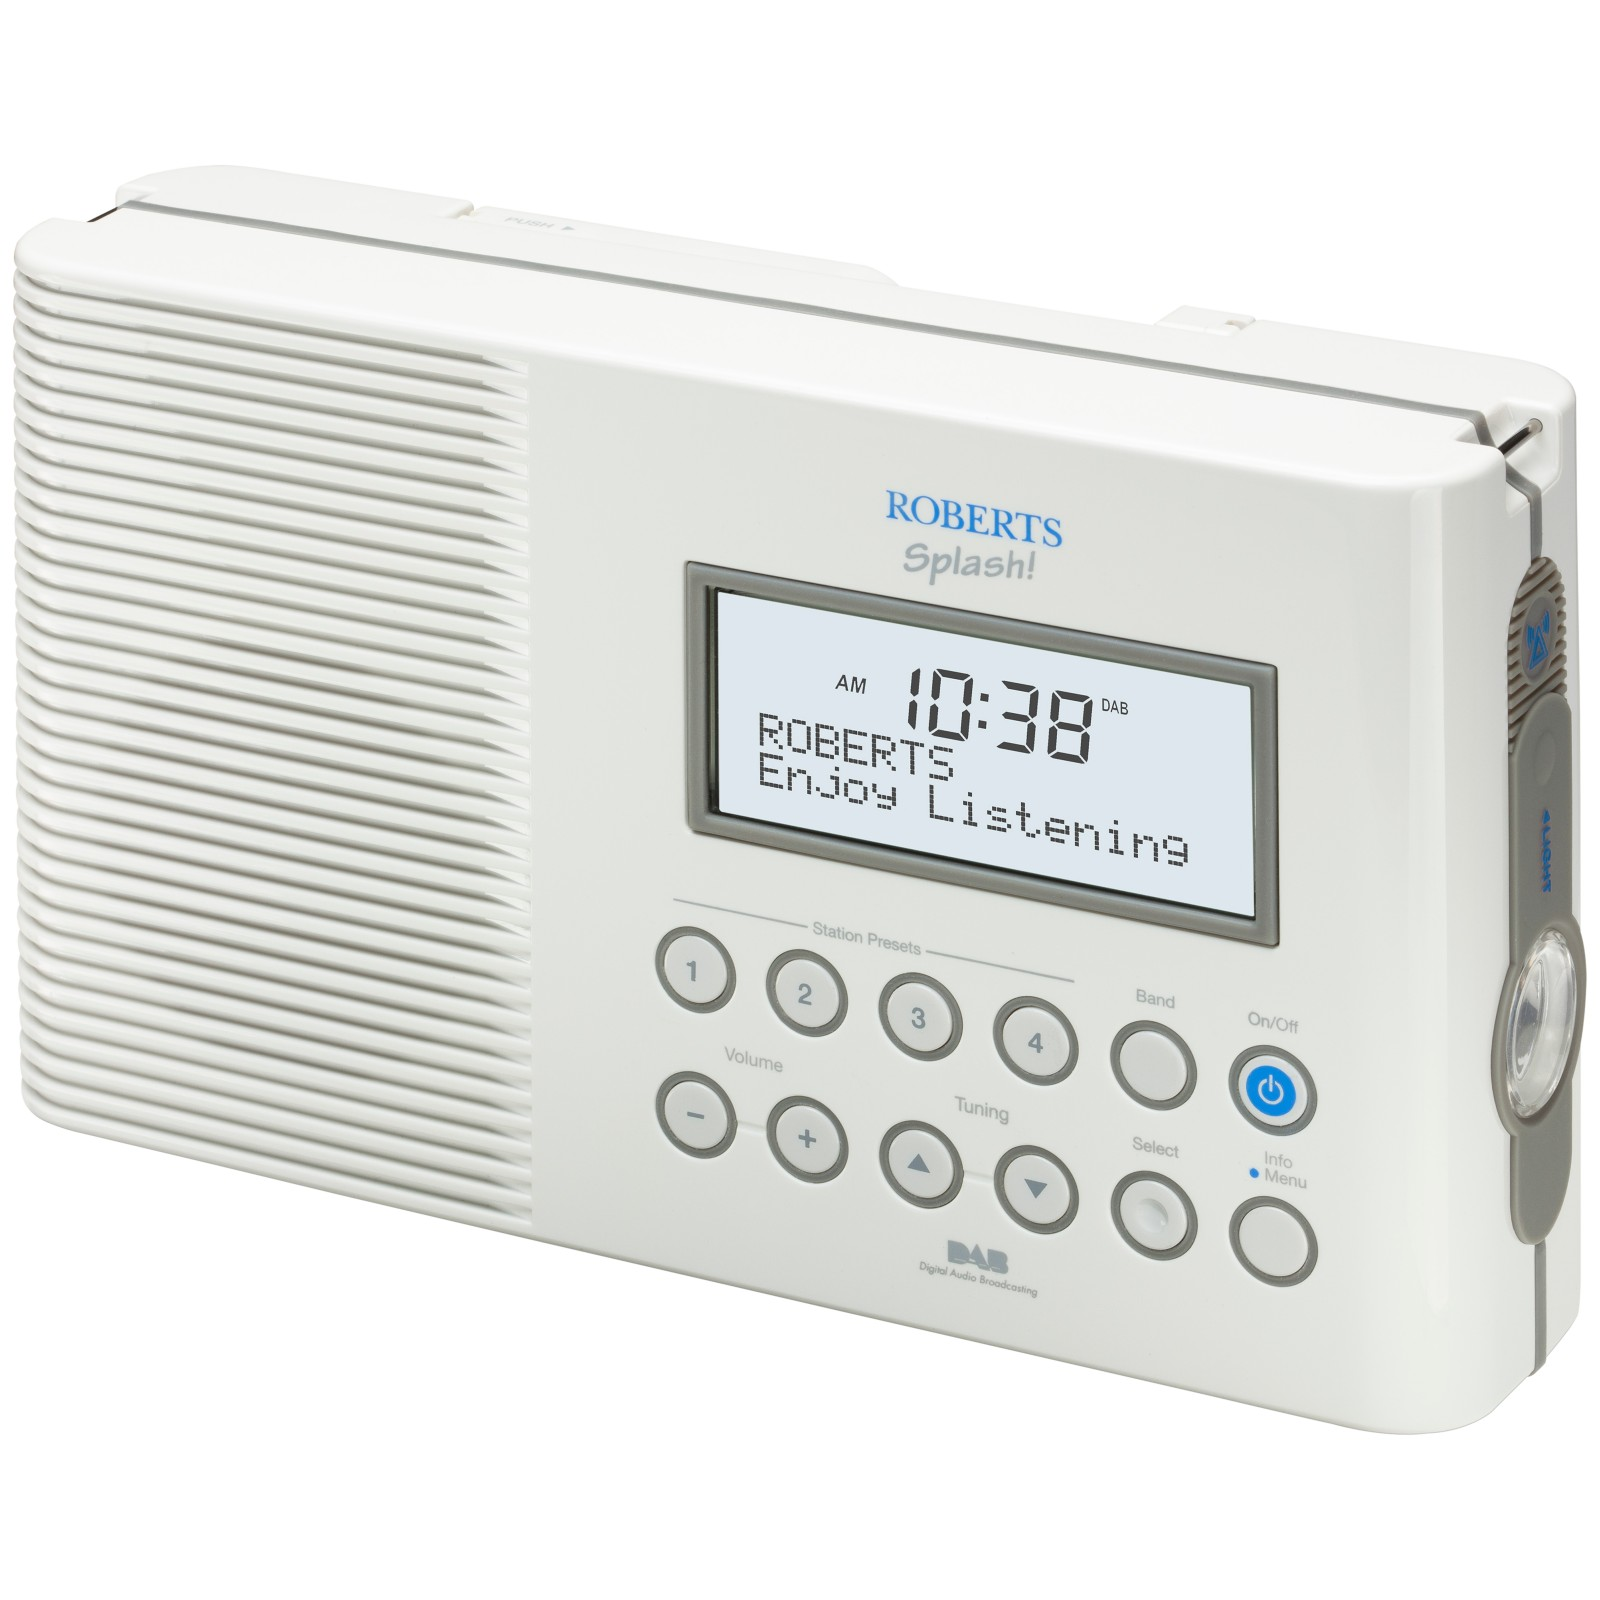 ROBERTS SPLASH! DAB/FM Shower Radio